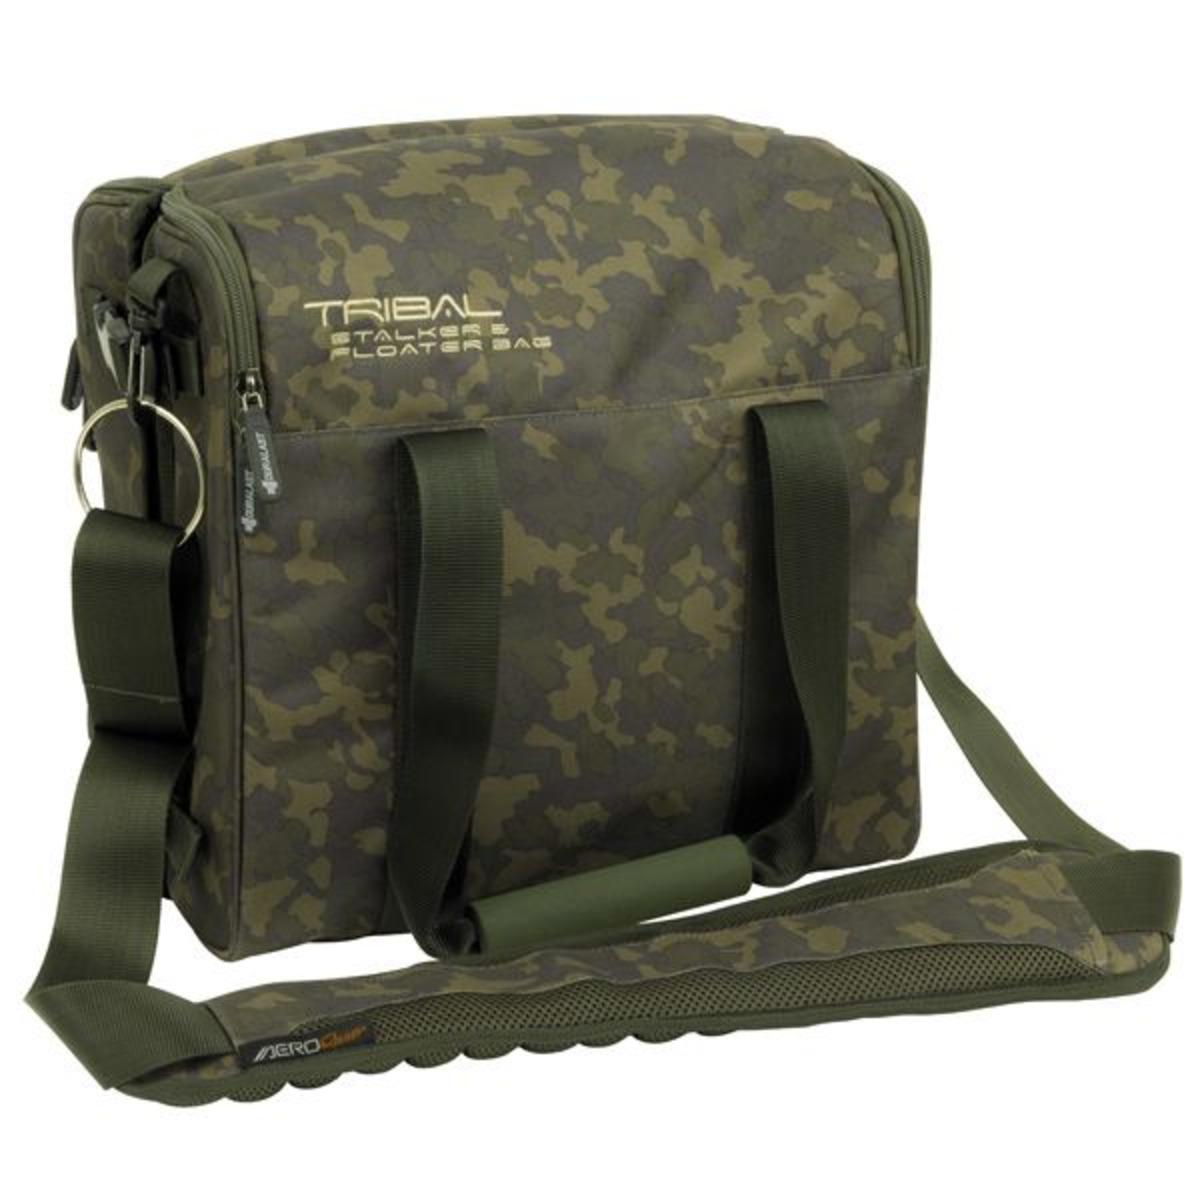 Shimano Tribal XTR Stalker and Floater Bag - 36x16x34 cm